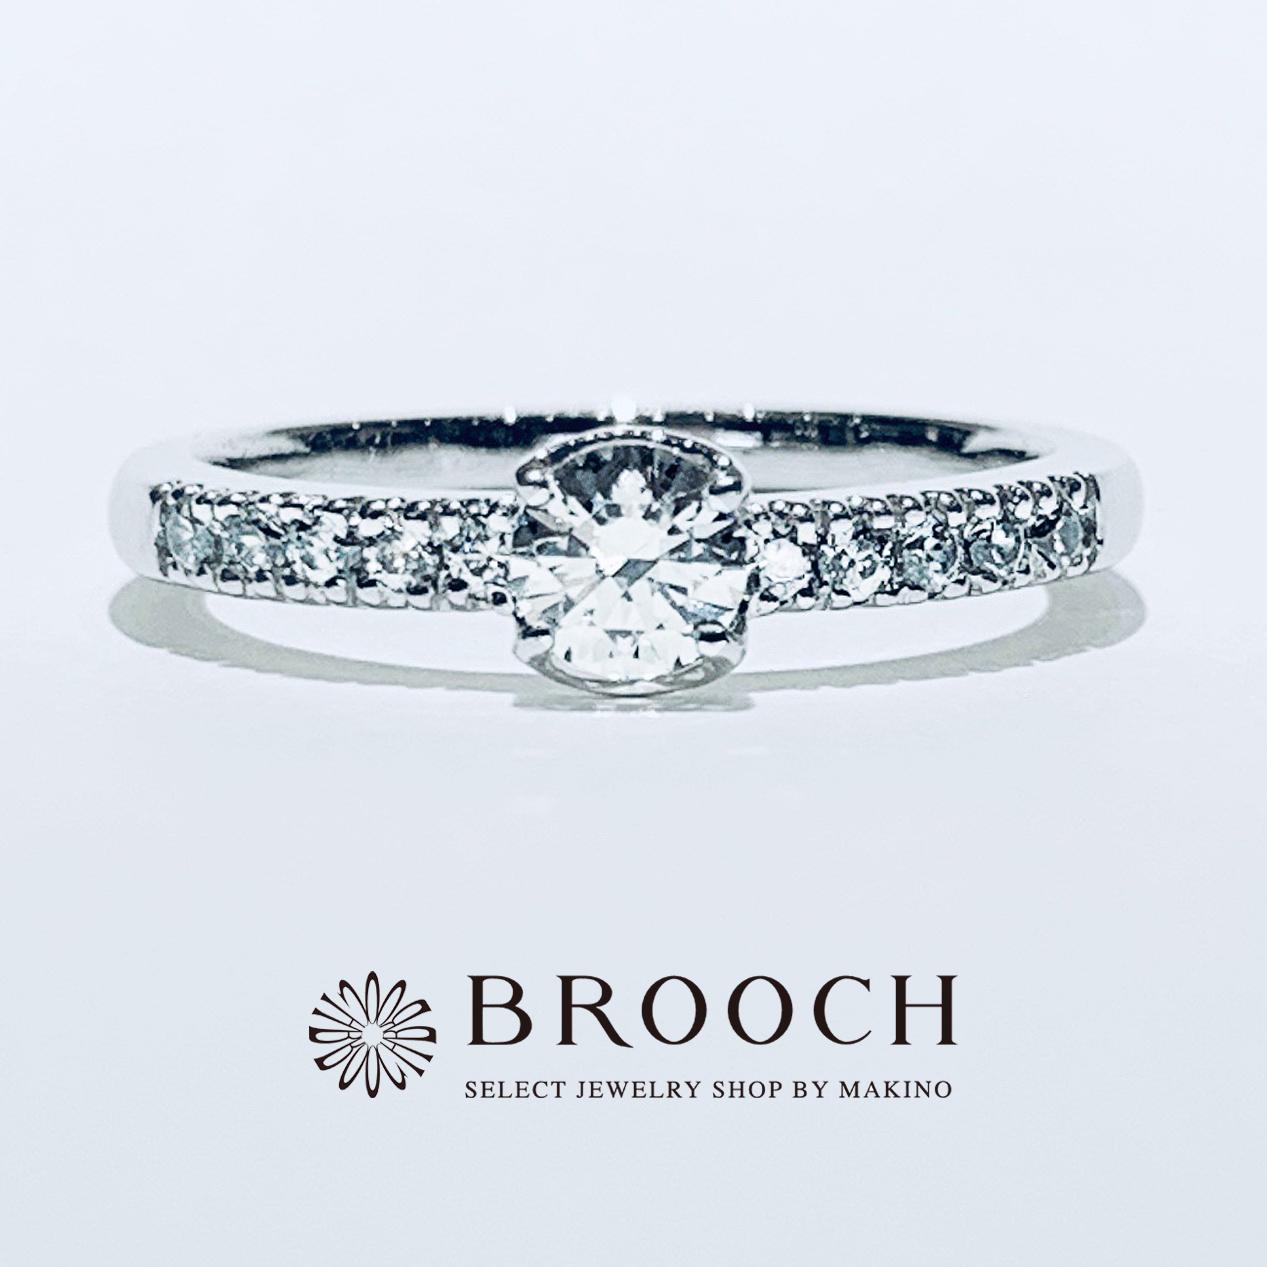 BROOCH 婚約指輪 エンゲージリング かわいい ダイヤモンドライン